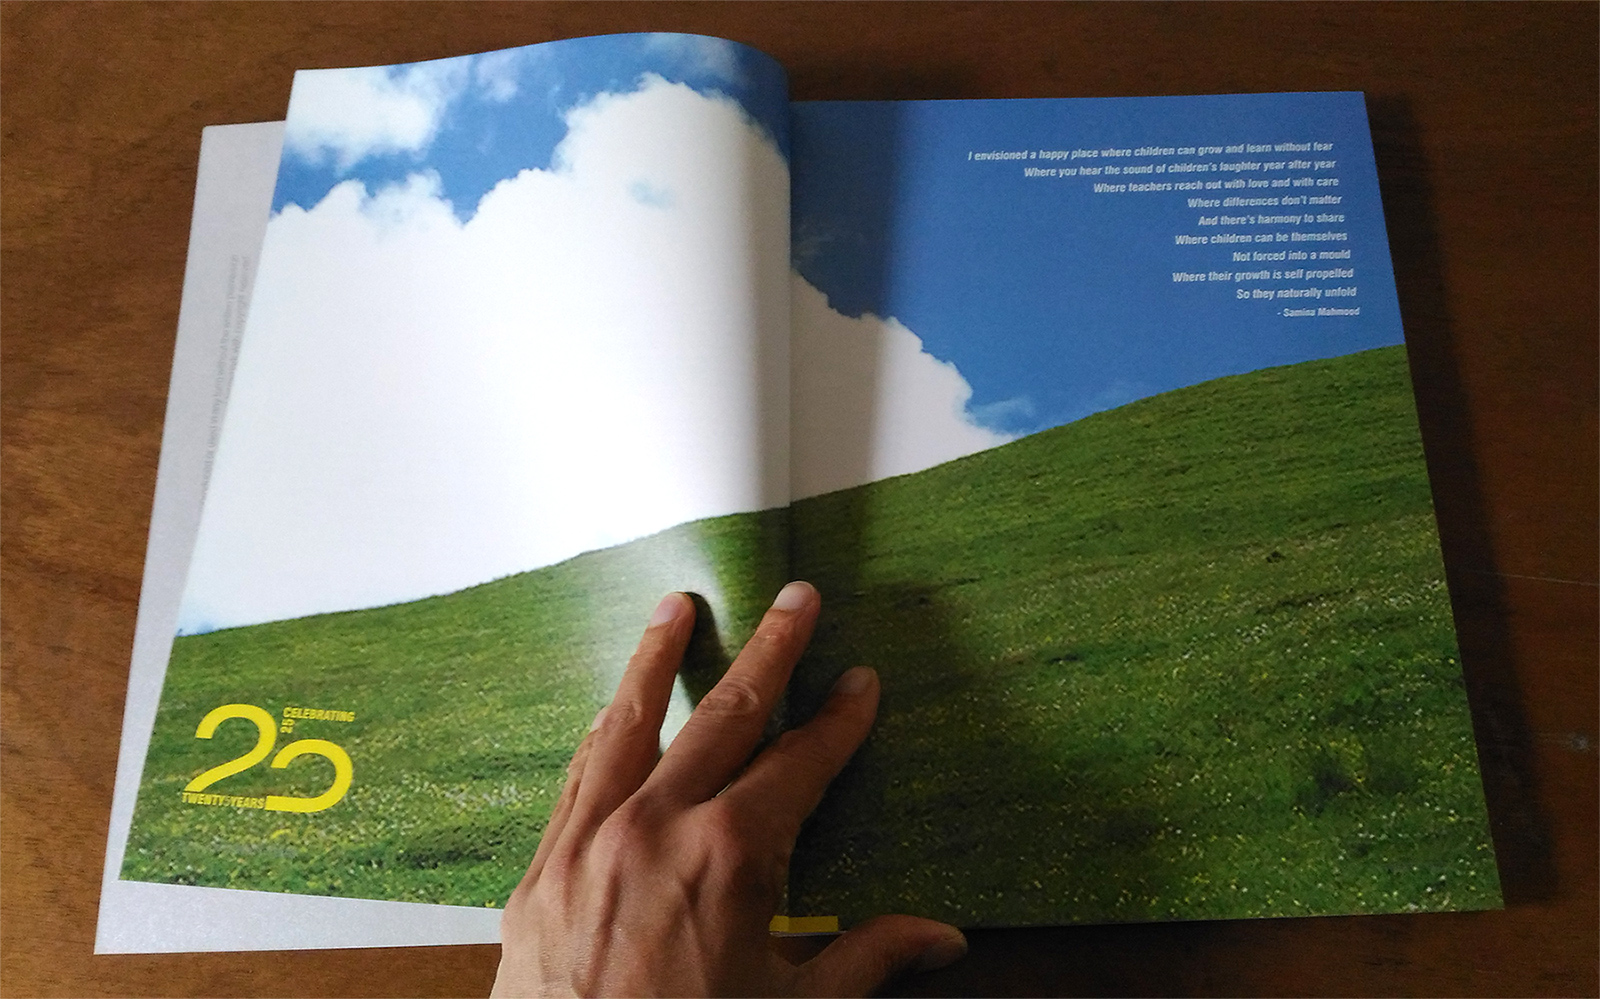 Head Start Montessori House of Children, book celebrating 25 years. Inner spread.